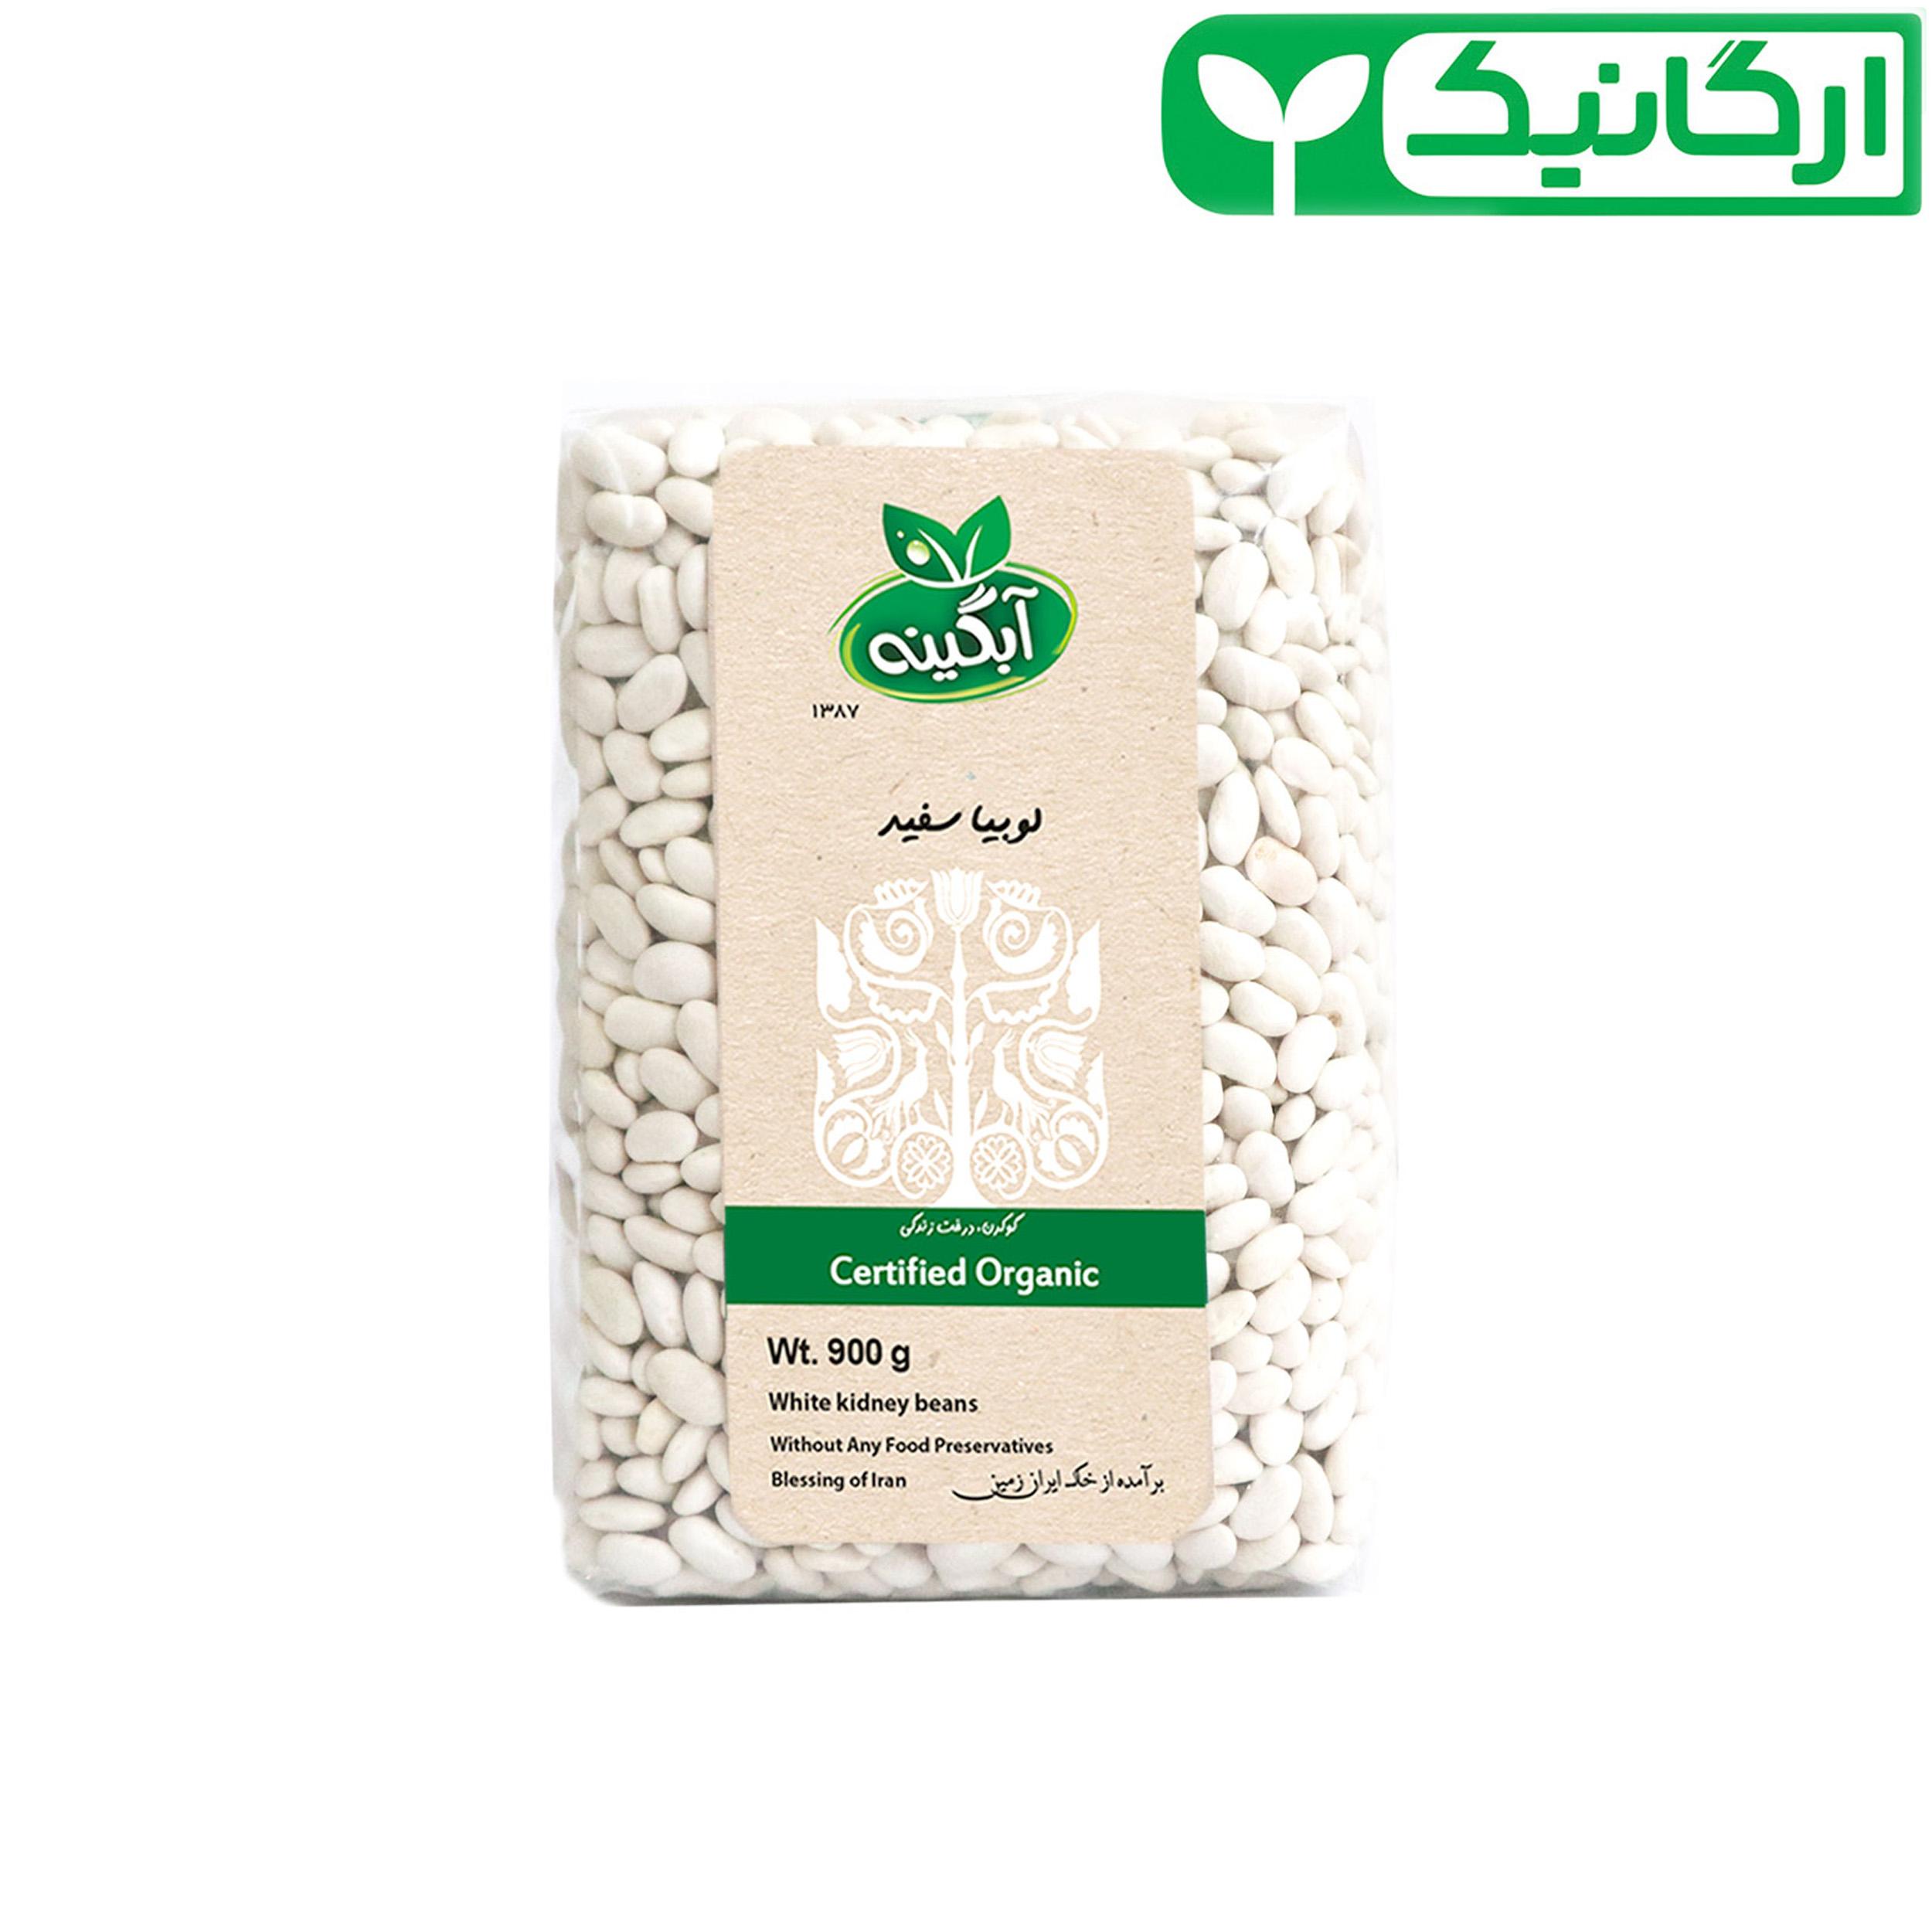 Abgineh Organic White kidney beans 900 grams